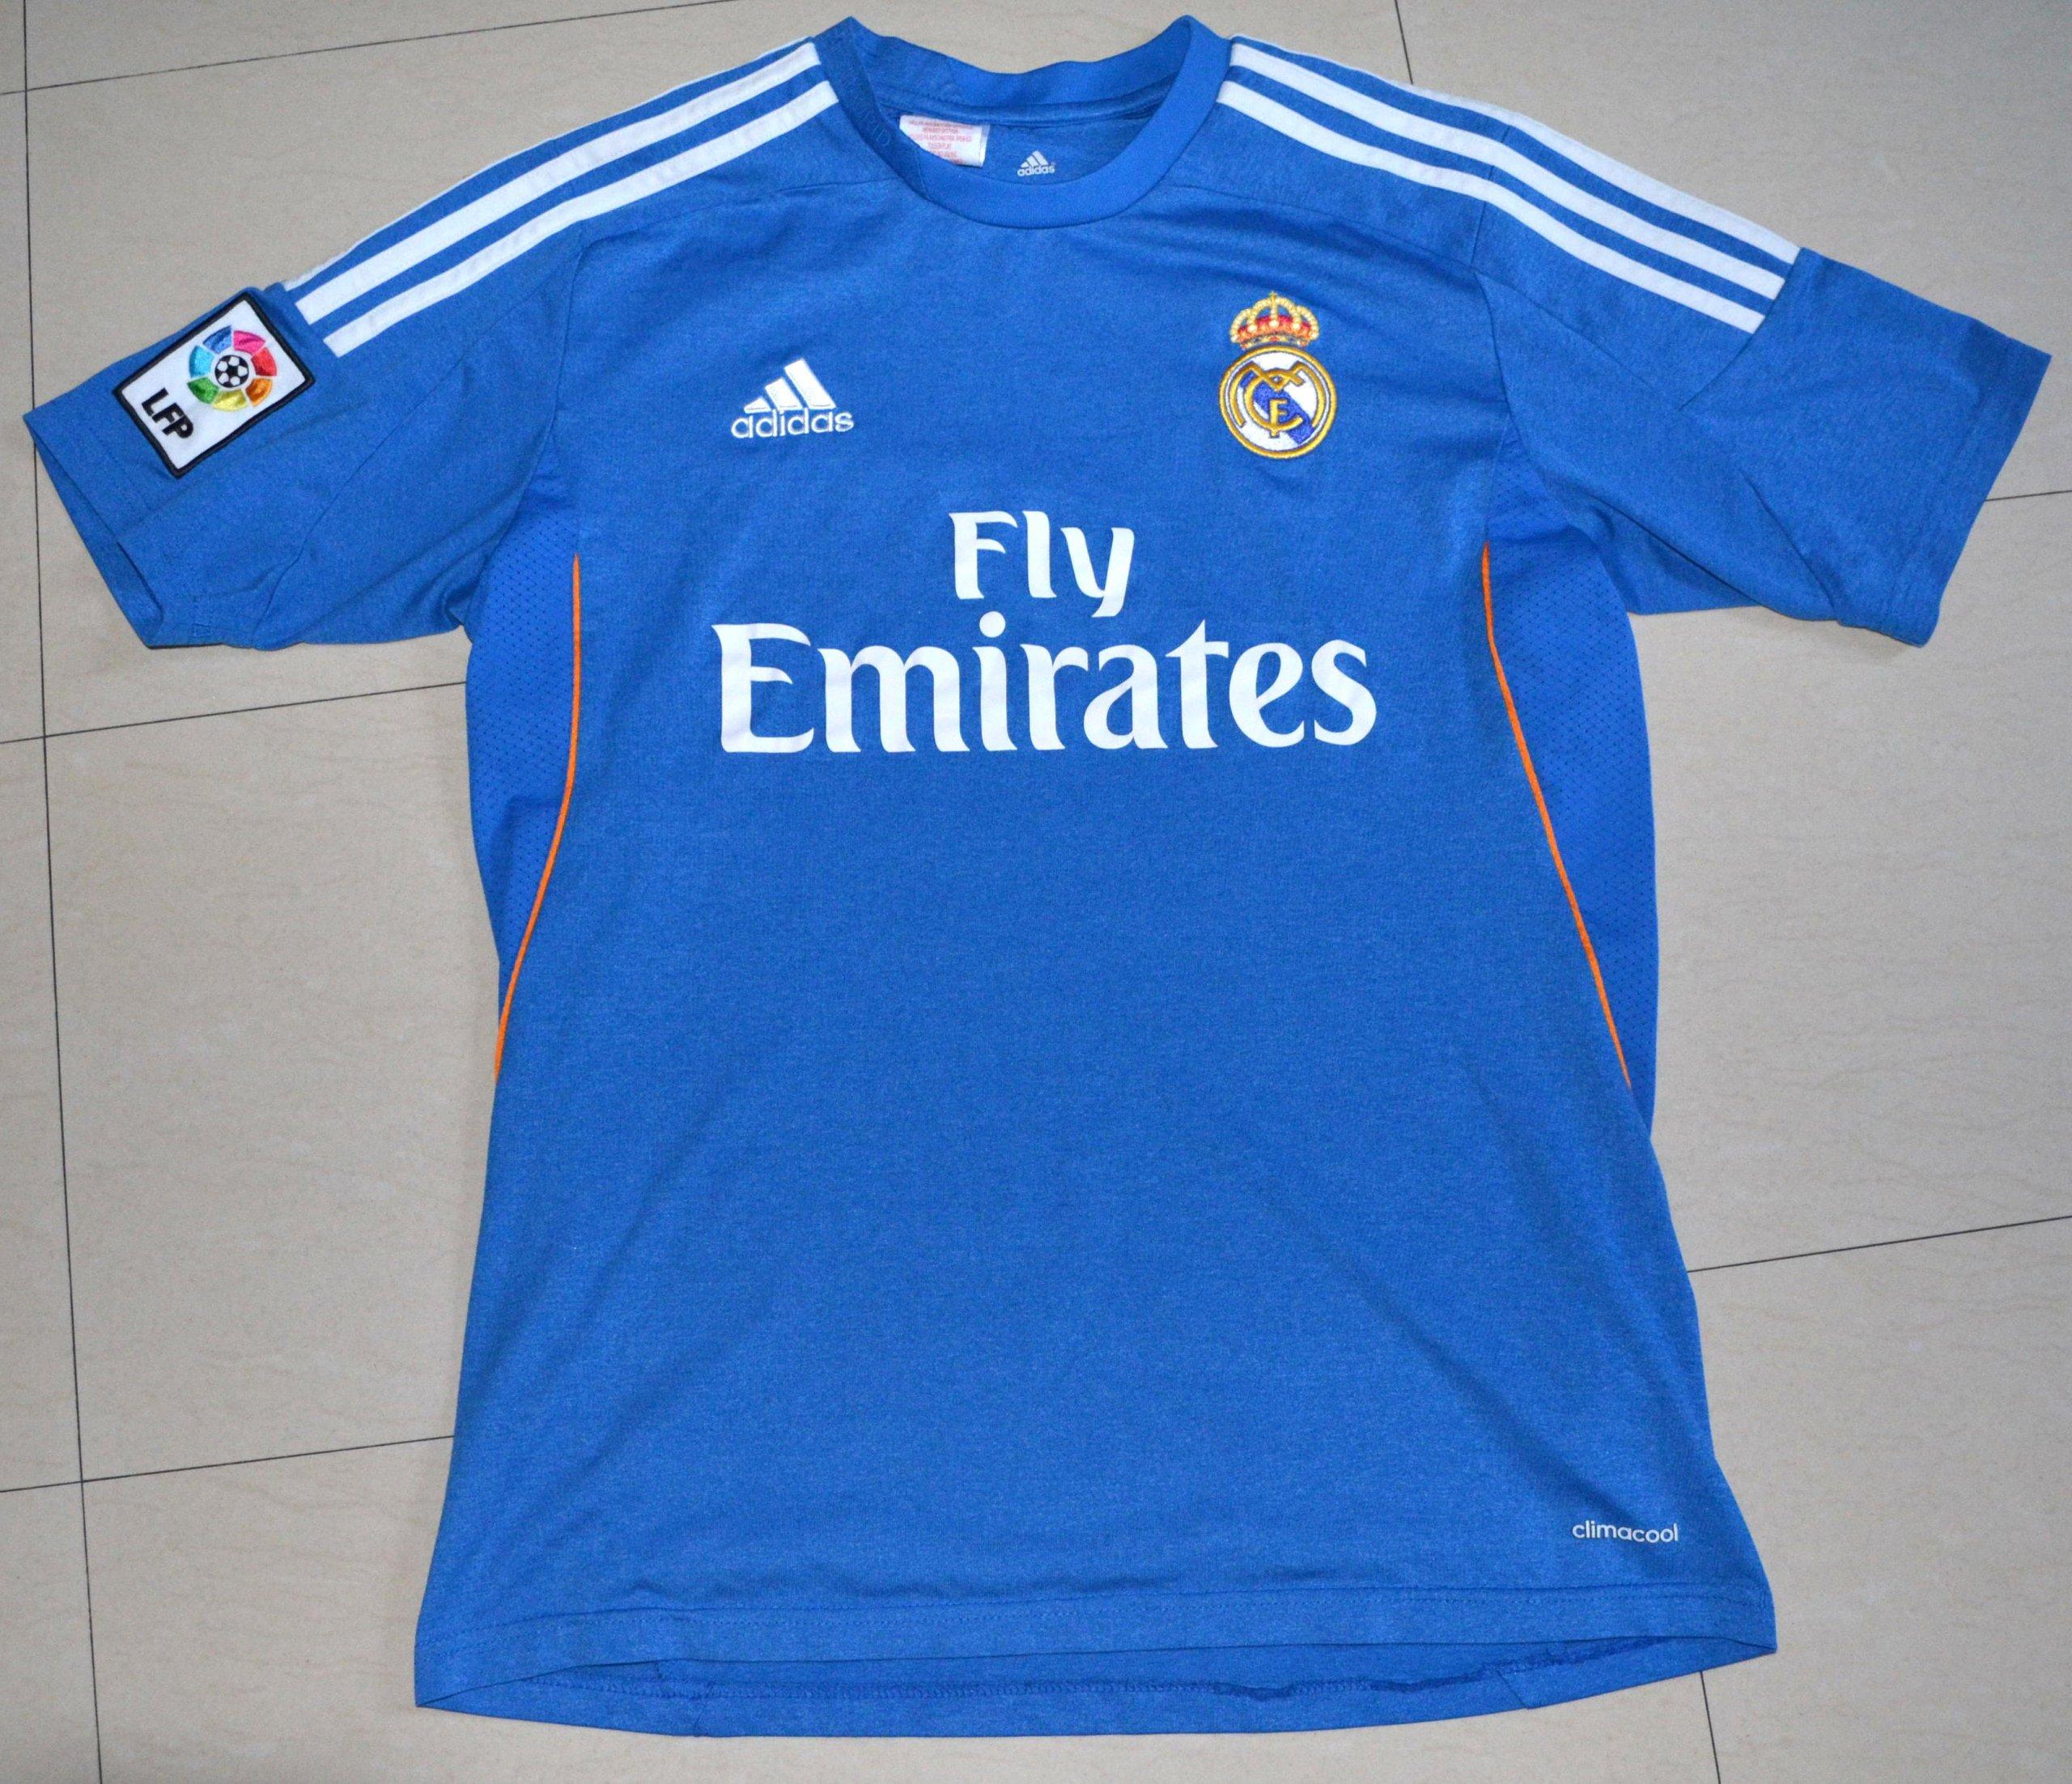 Niewiarygodnie Koszulka t-shirt Fly Emirates Adidas Real Madryt L - 7199072712 TG63